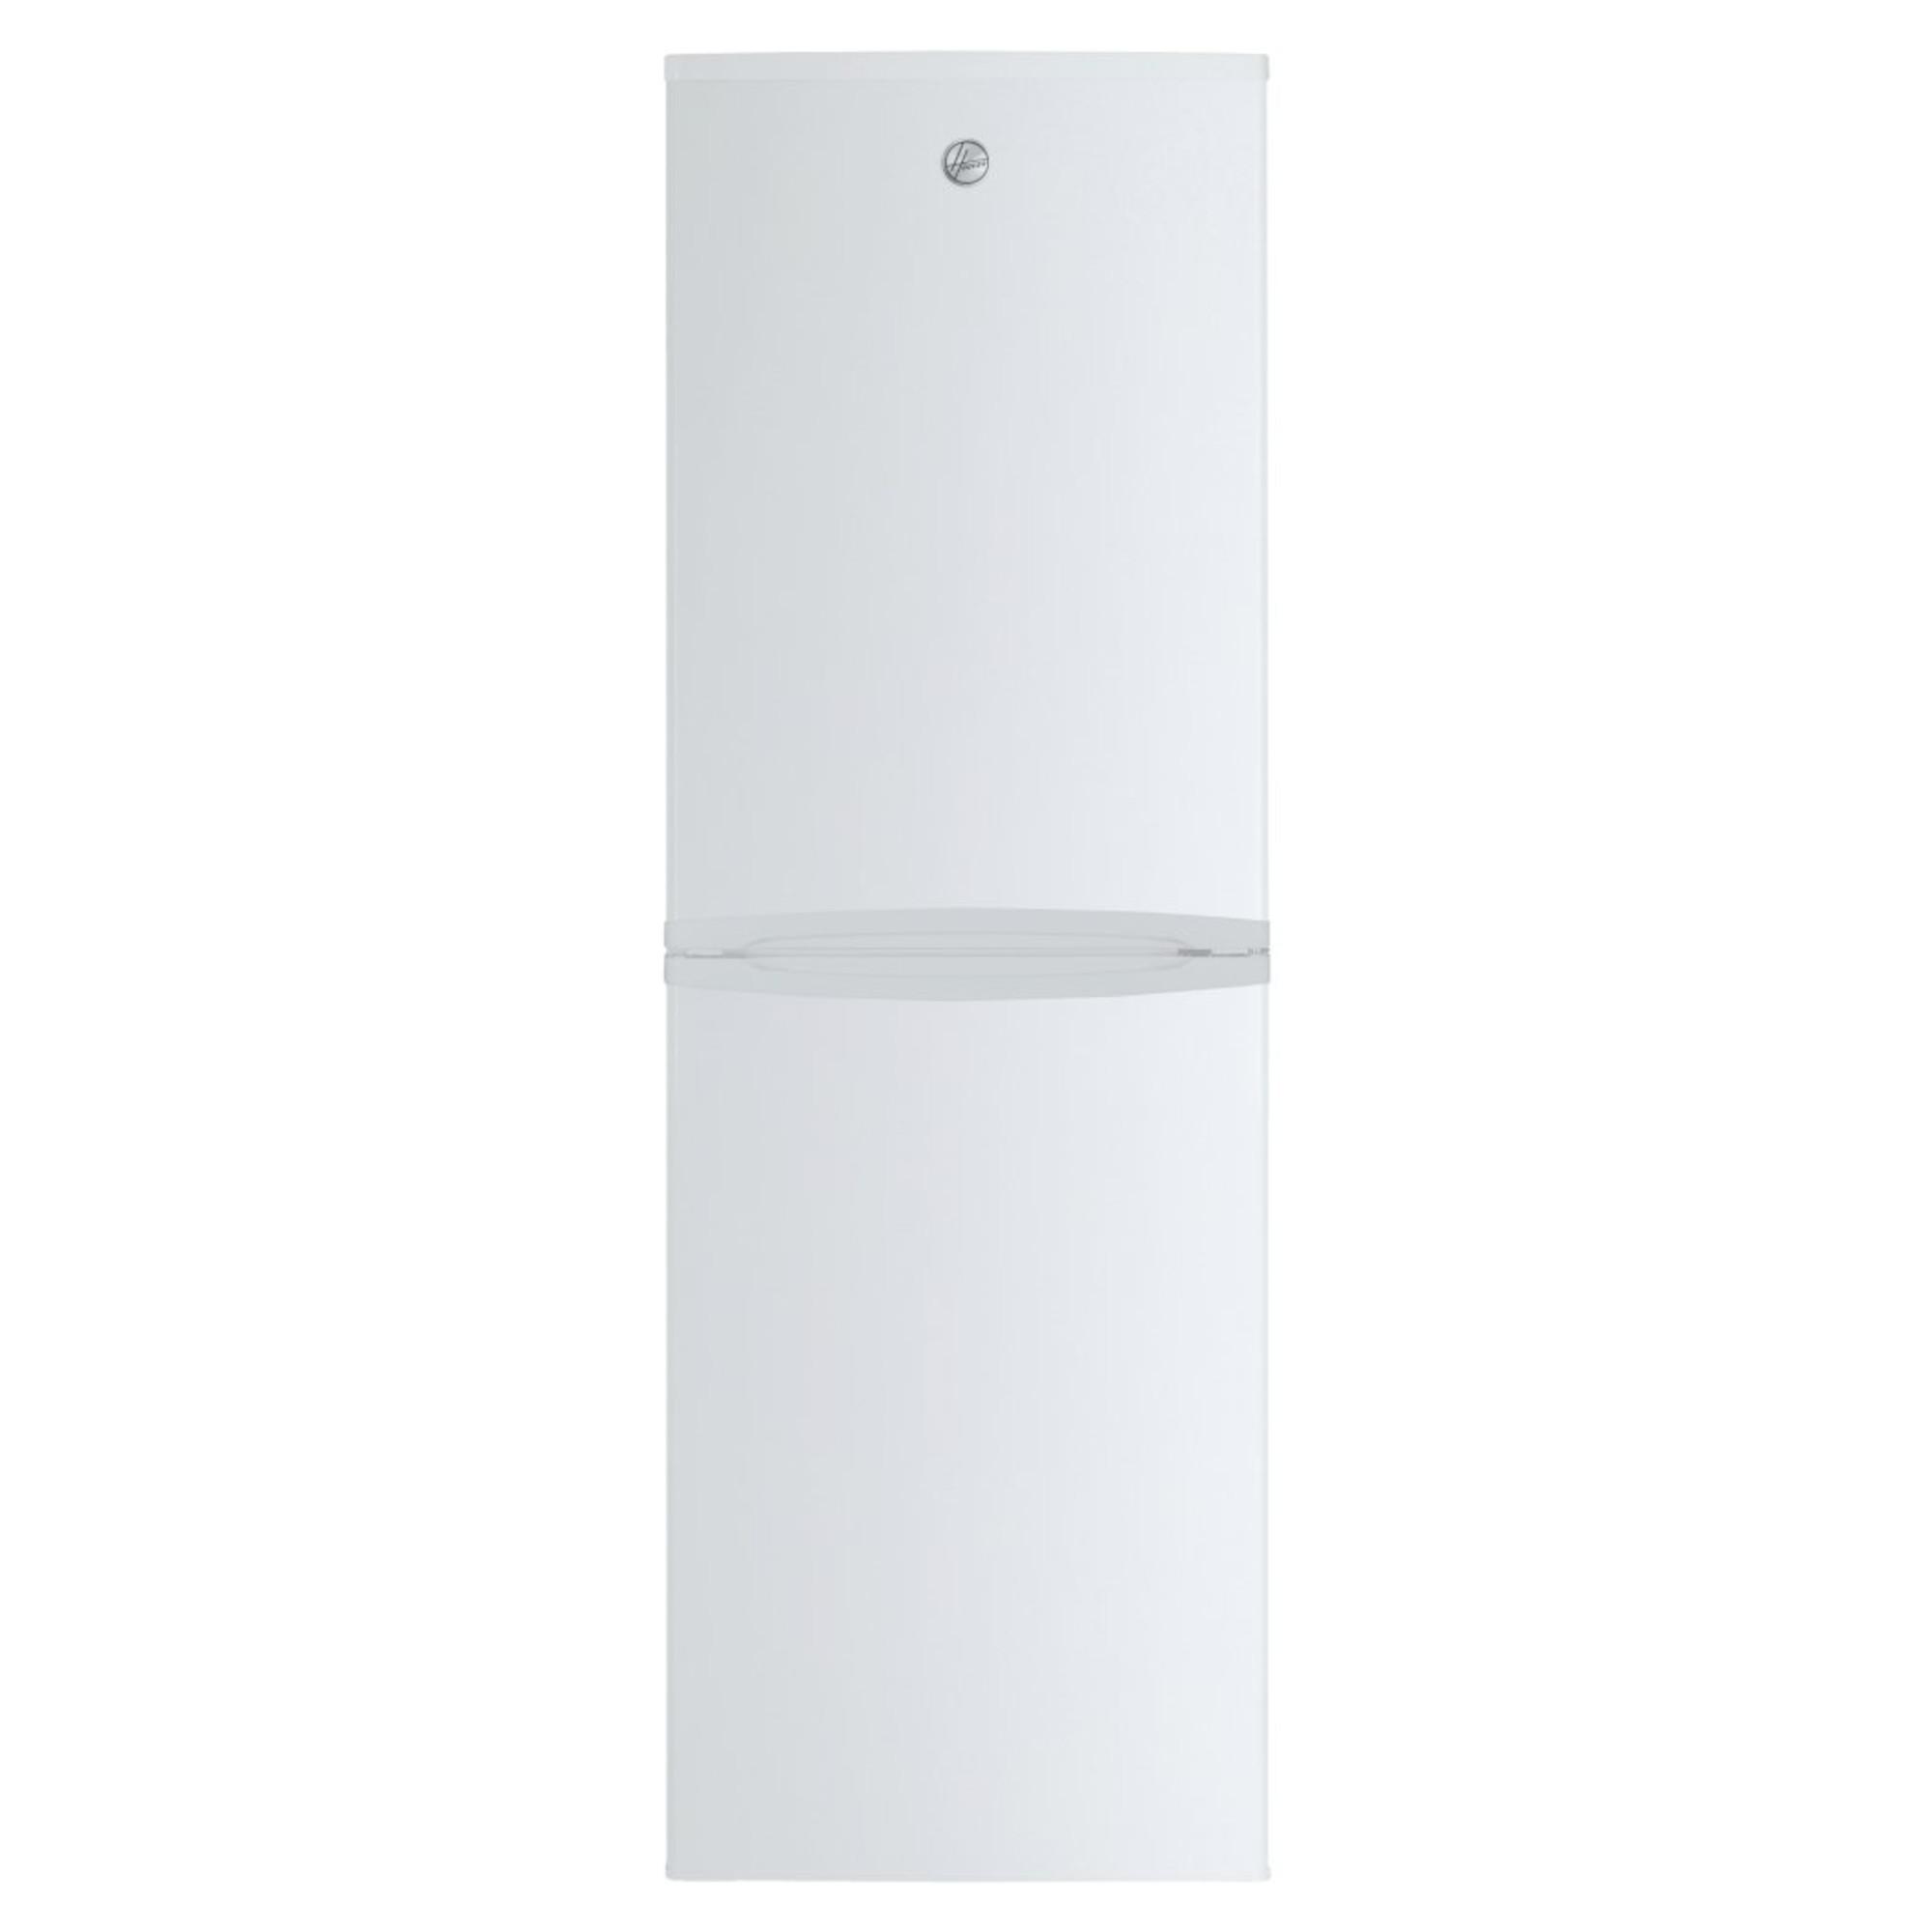 Hoover HSC577WKN Freestanding Fridge Freezer